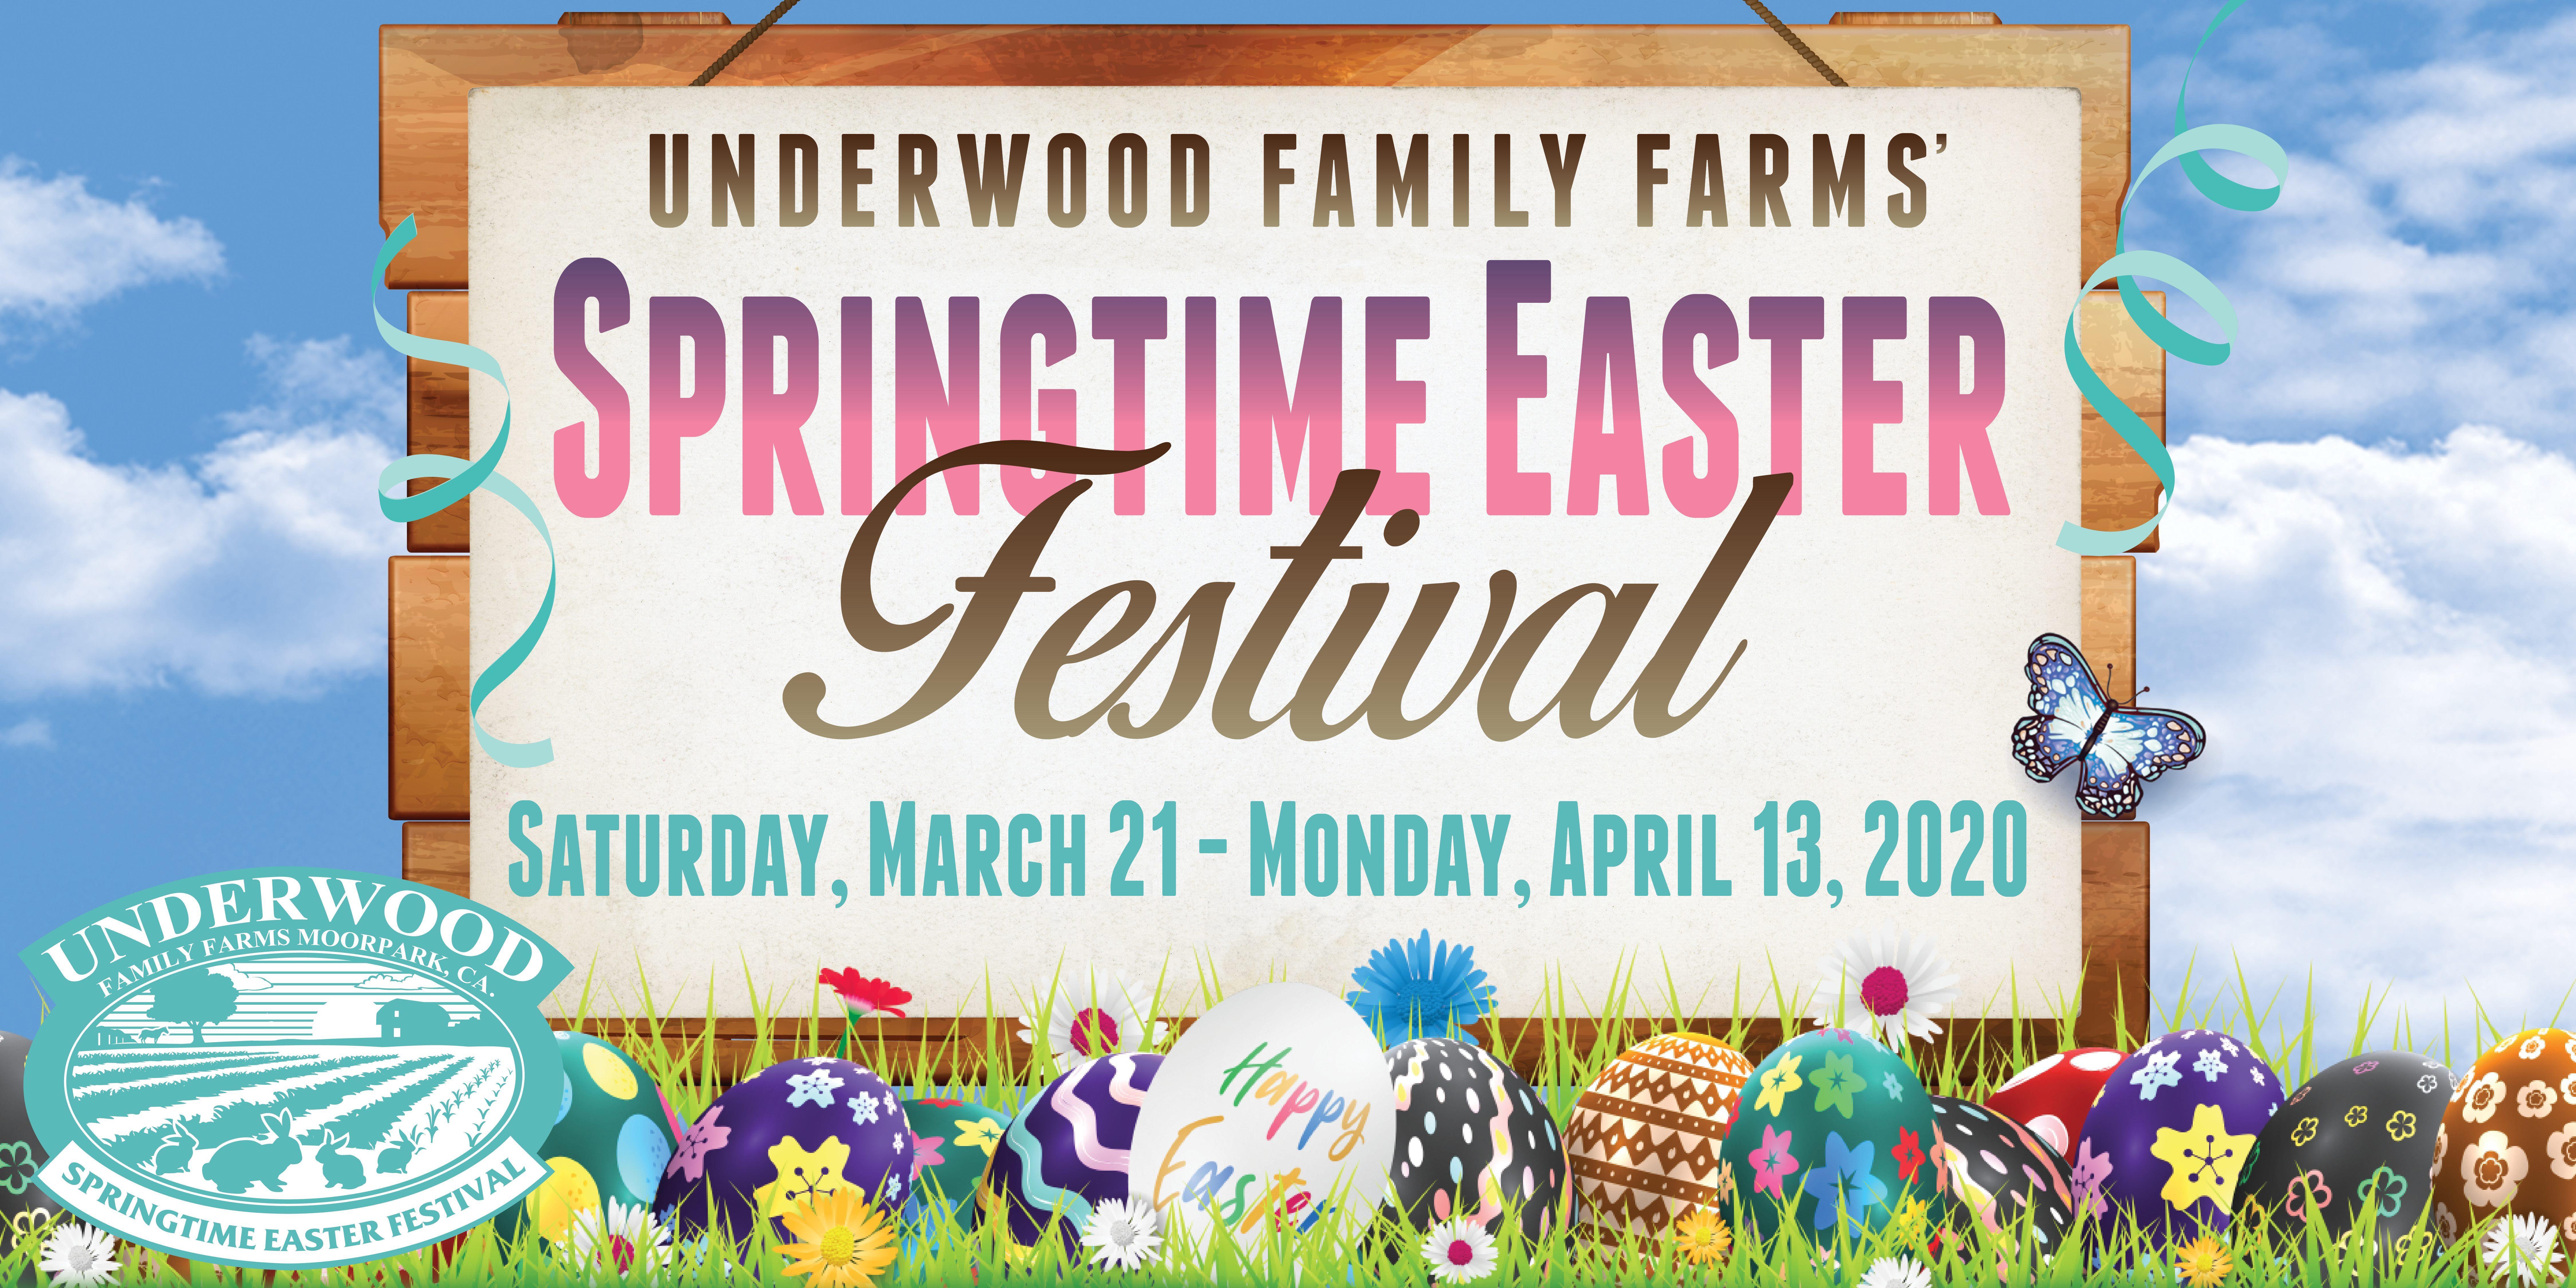 Underwood Family Farms' Springtime Easter Festival 2020